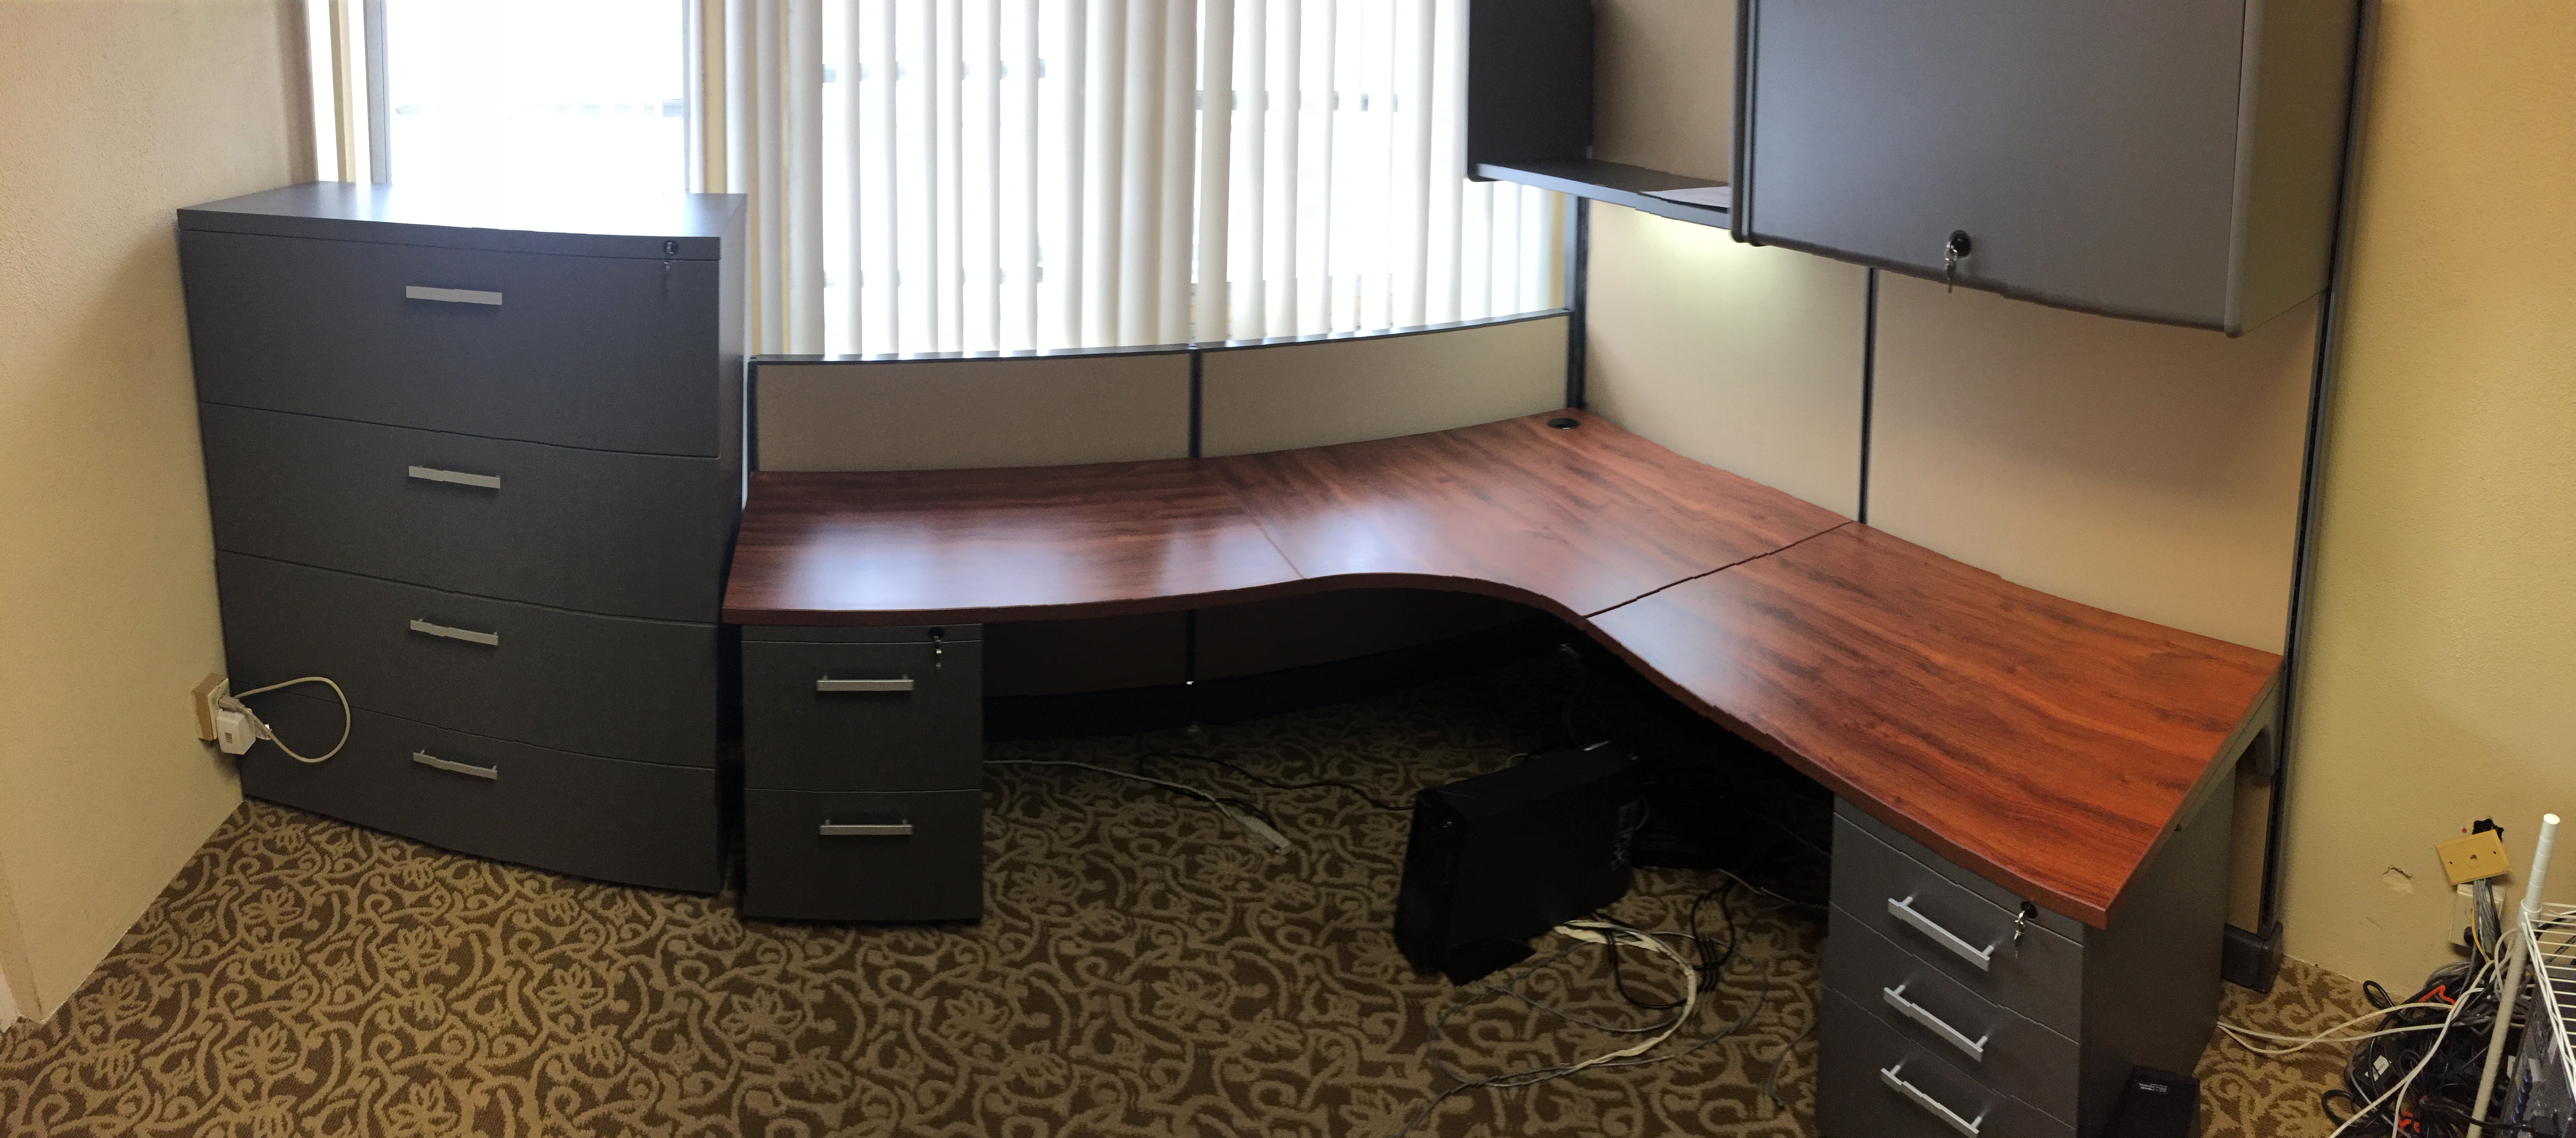 new-office-furniture-bradenton-florida-manasota-office-supplies-llc.jpg